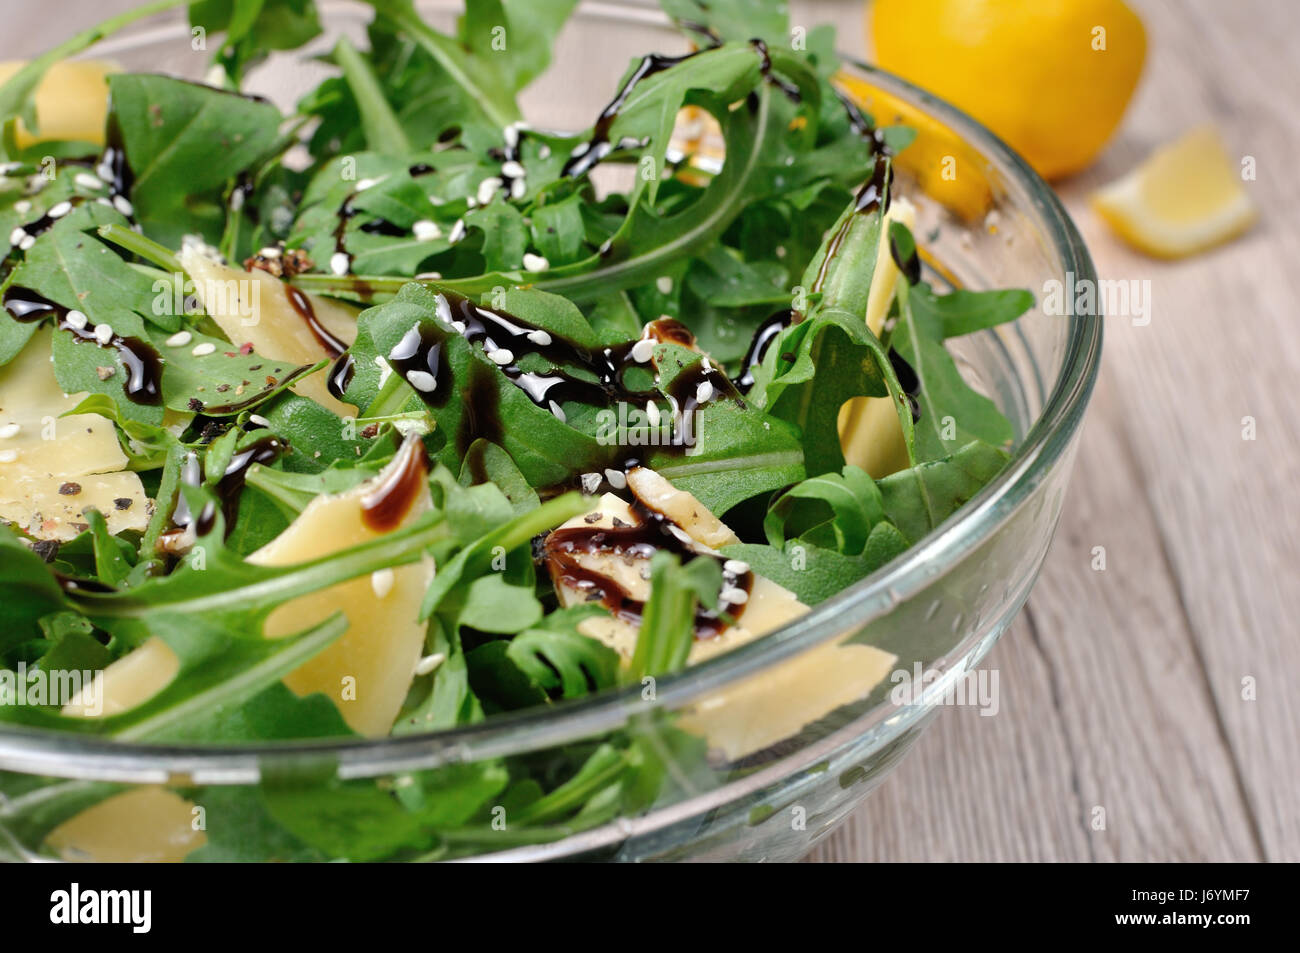 Arugula Rocket Salad Dressed With Balsamic Soy Sauce Parmesan Shavings And Freshly Ground Black Pepper Sesame Horizontal Shot